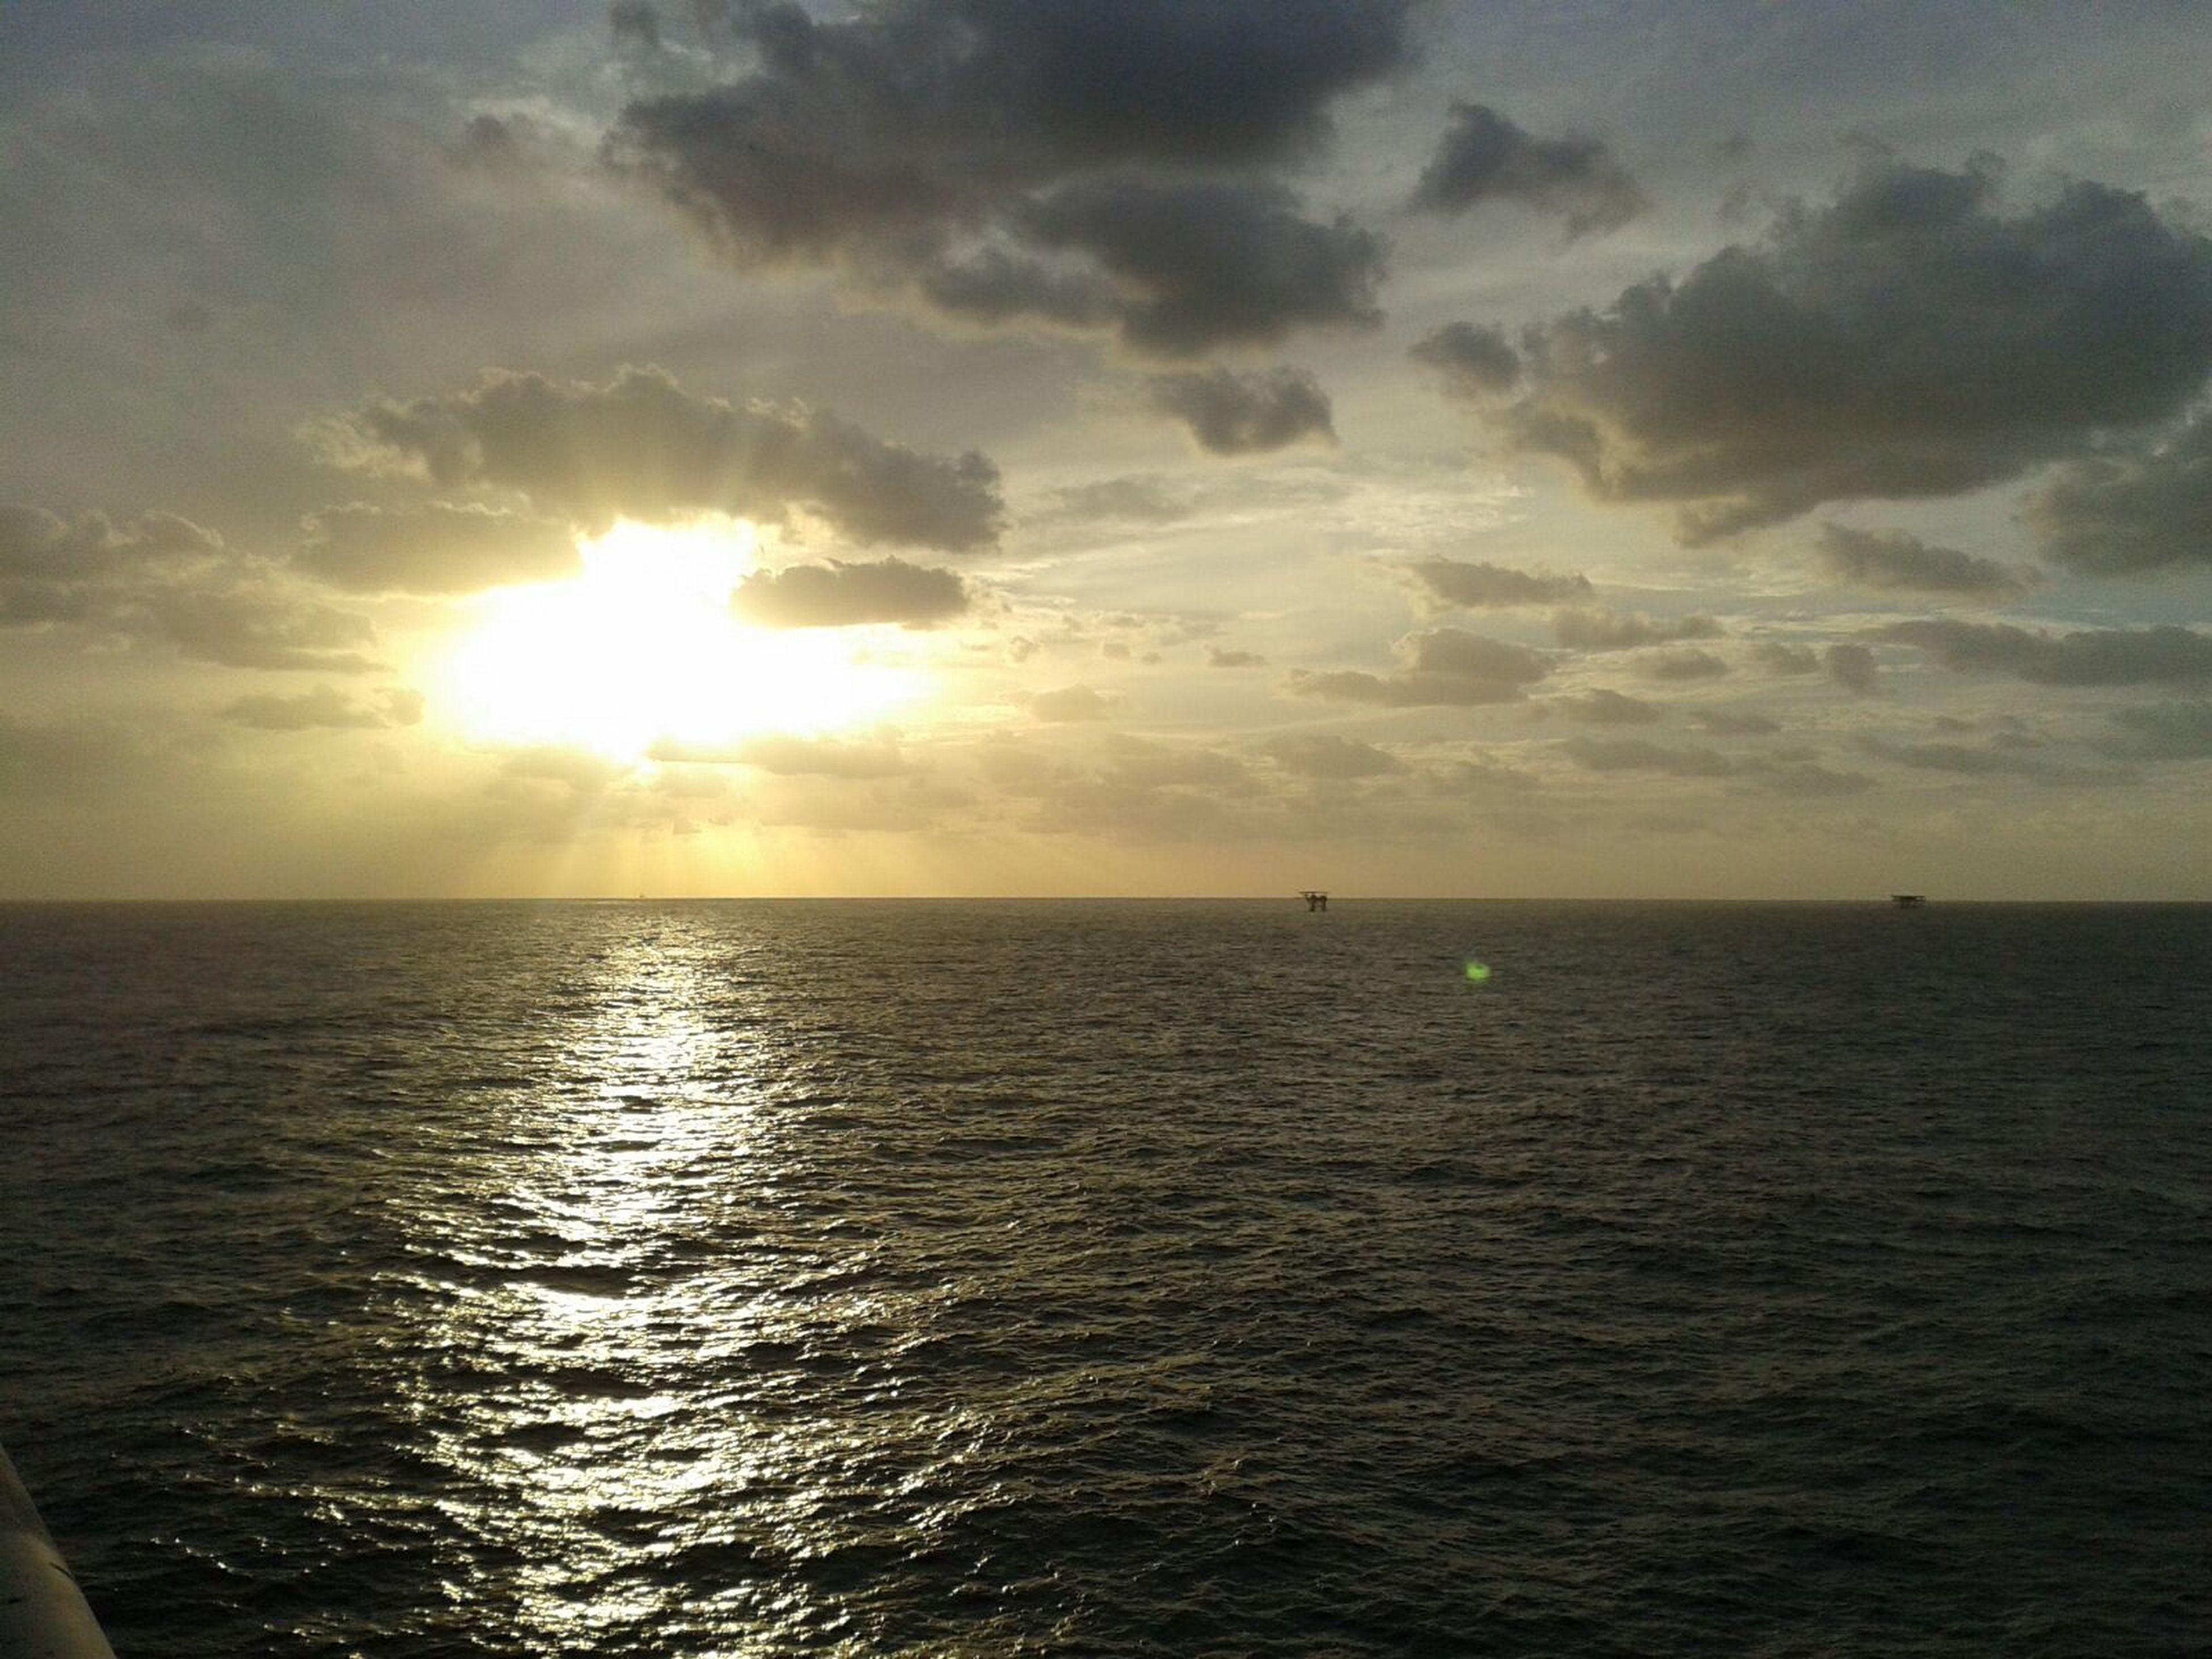 sea, horizon over water, sun, sunset, tranquil scene, tranquility, water, scenics, idyllic, sunbeam, beauty in nature, nature, rippled, sunlight, no people, sky, outdoors, day